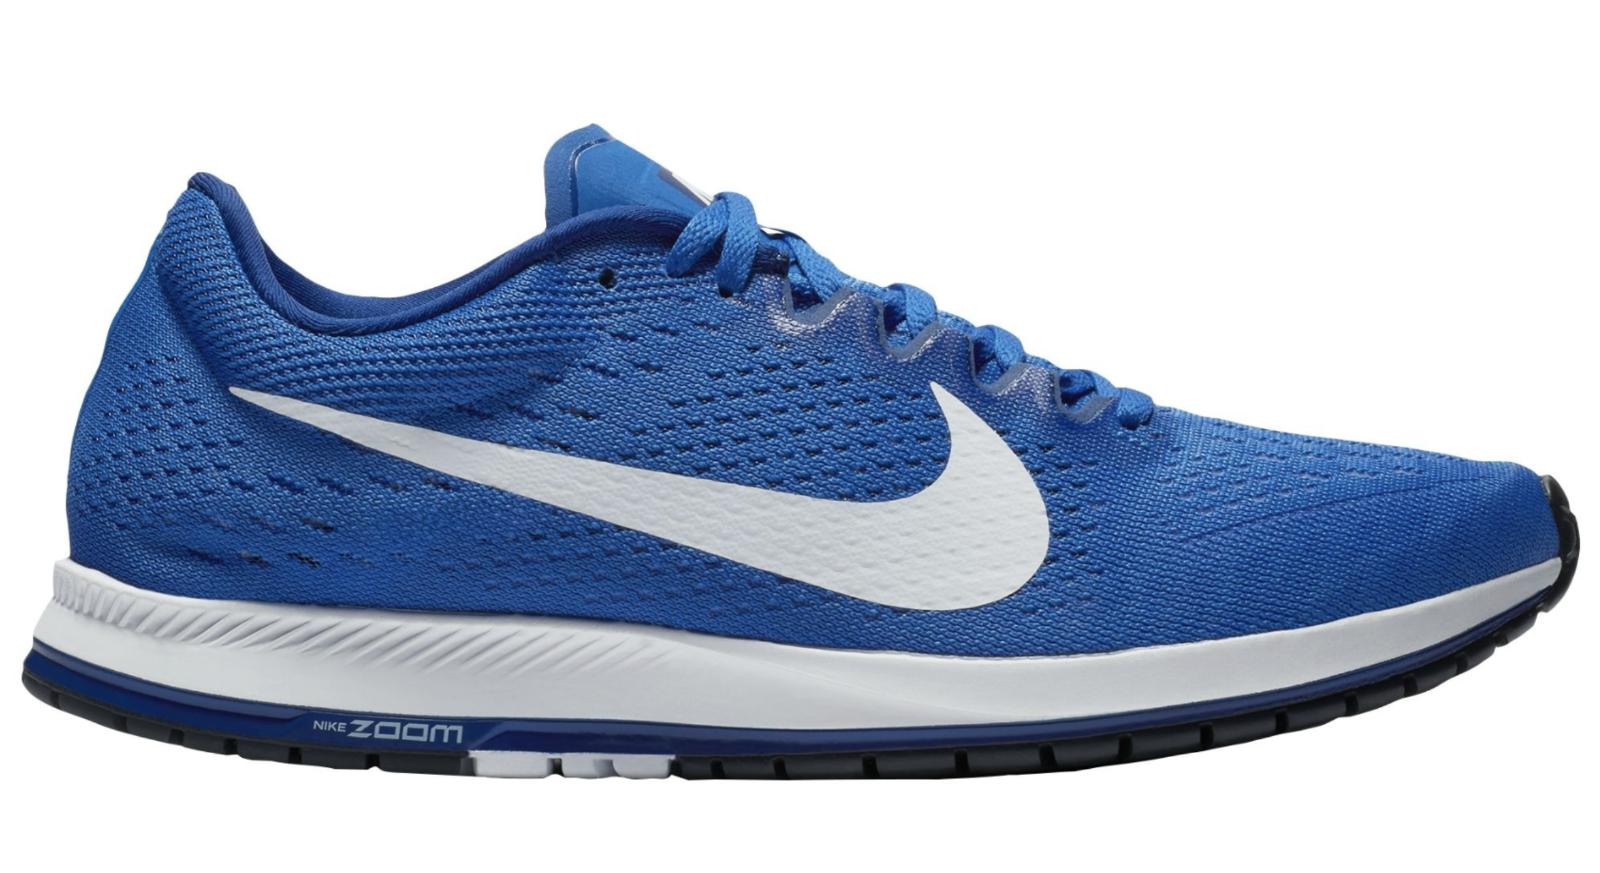 NUOVO Mens Nike Zoom Streak 6 831413 411 Scarpe correnti  Hyper Royal  bianca  Deep blu  servizio onesto